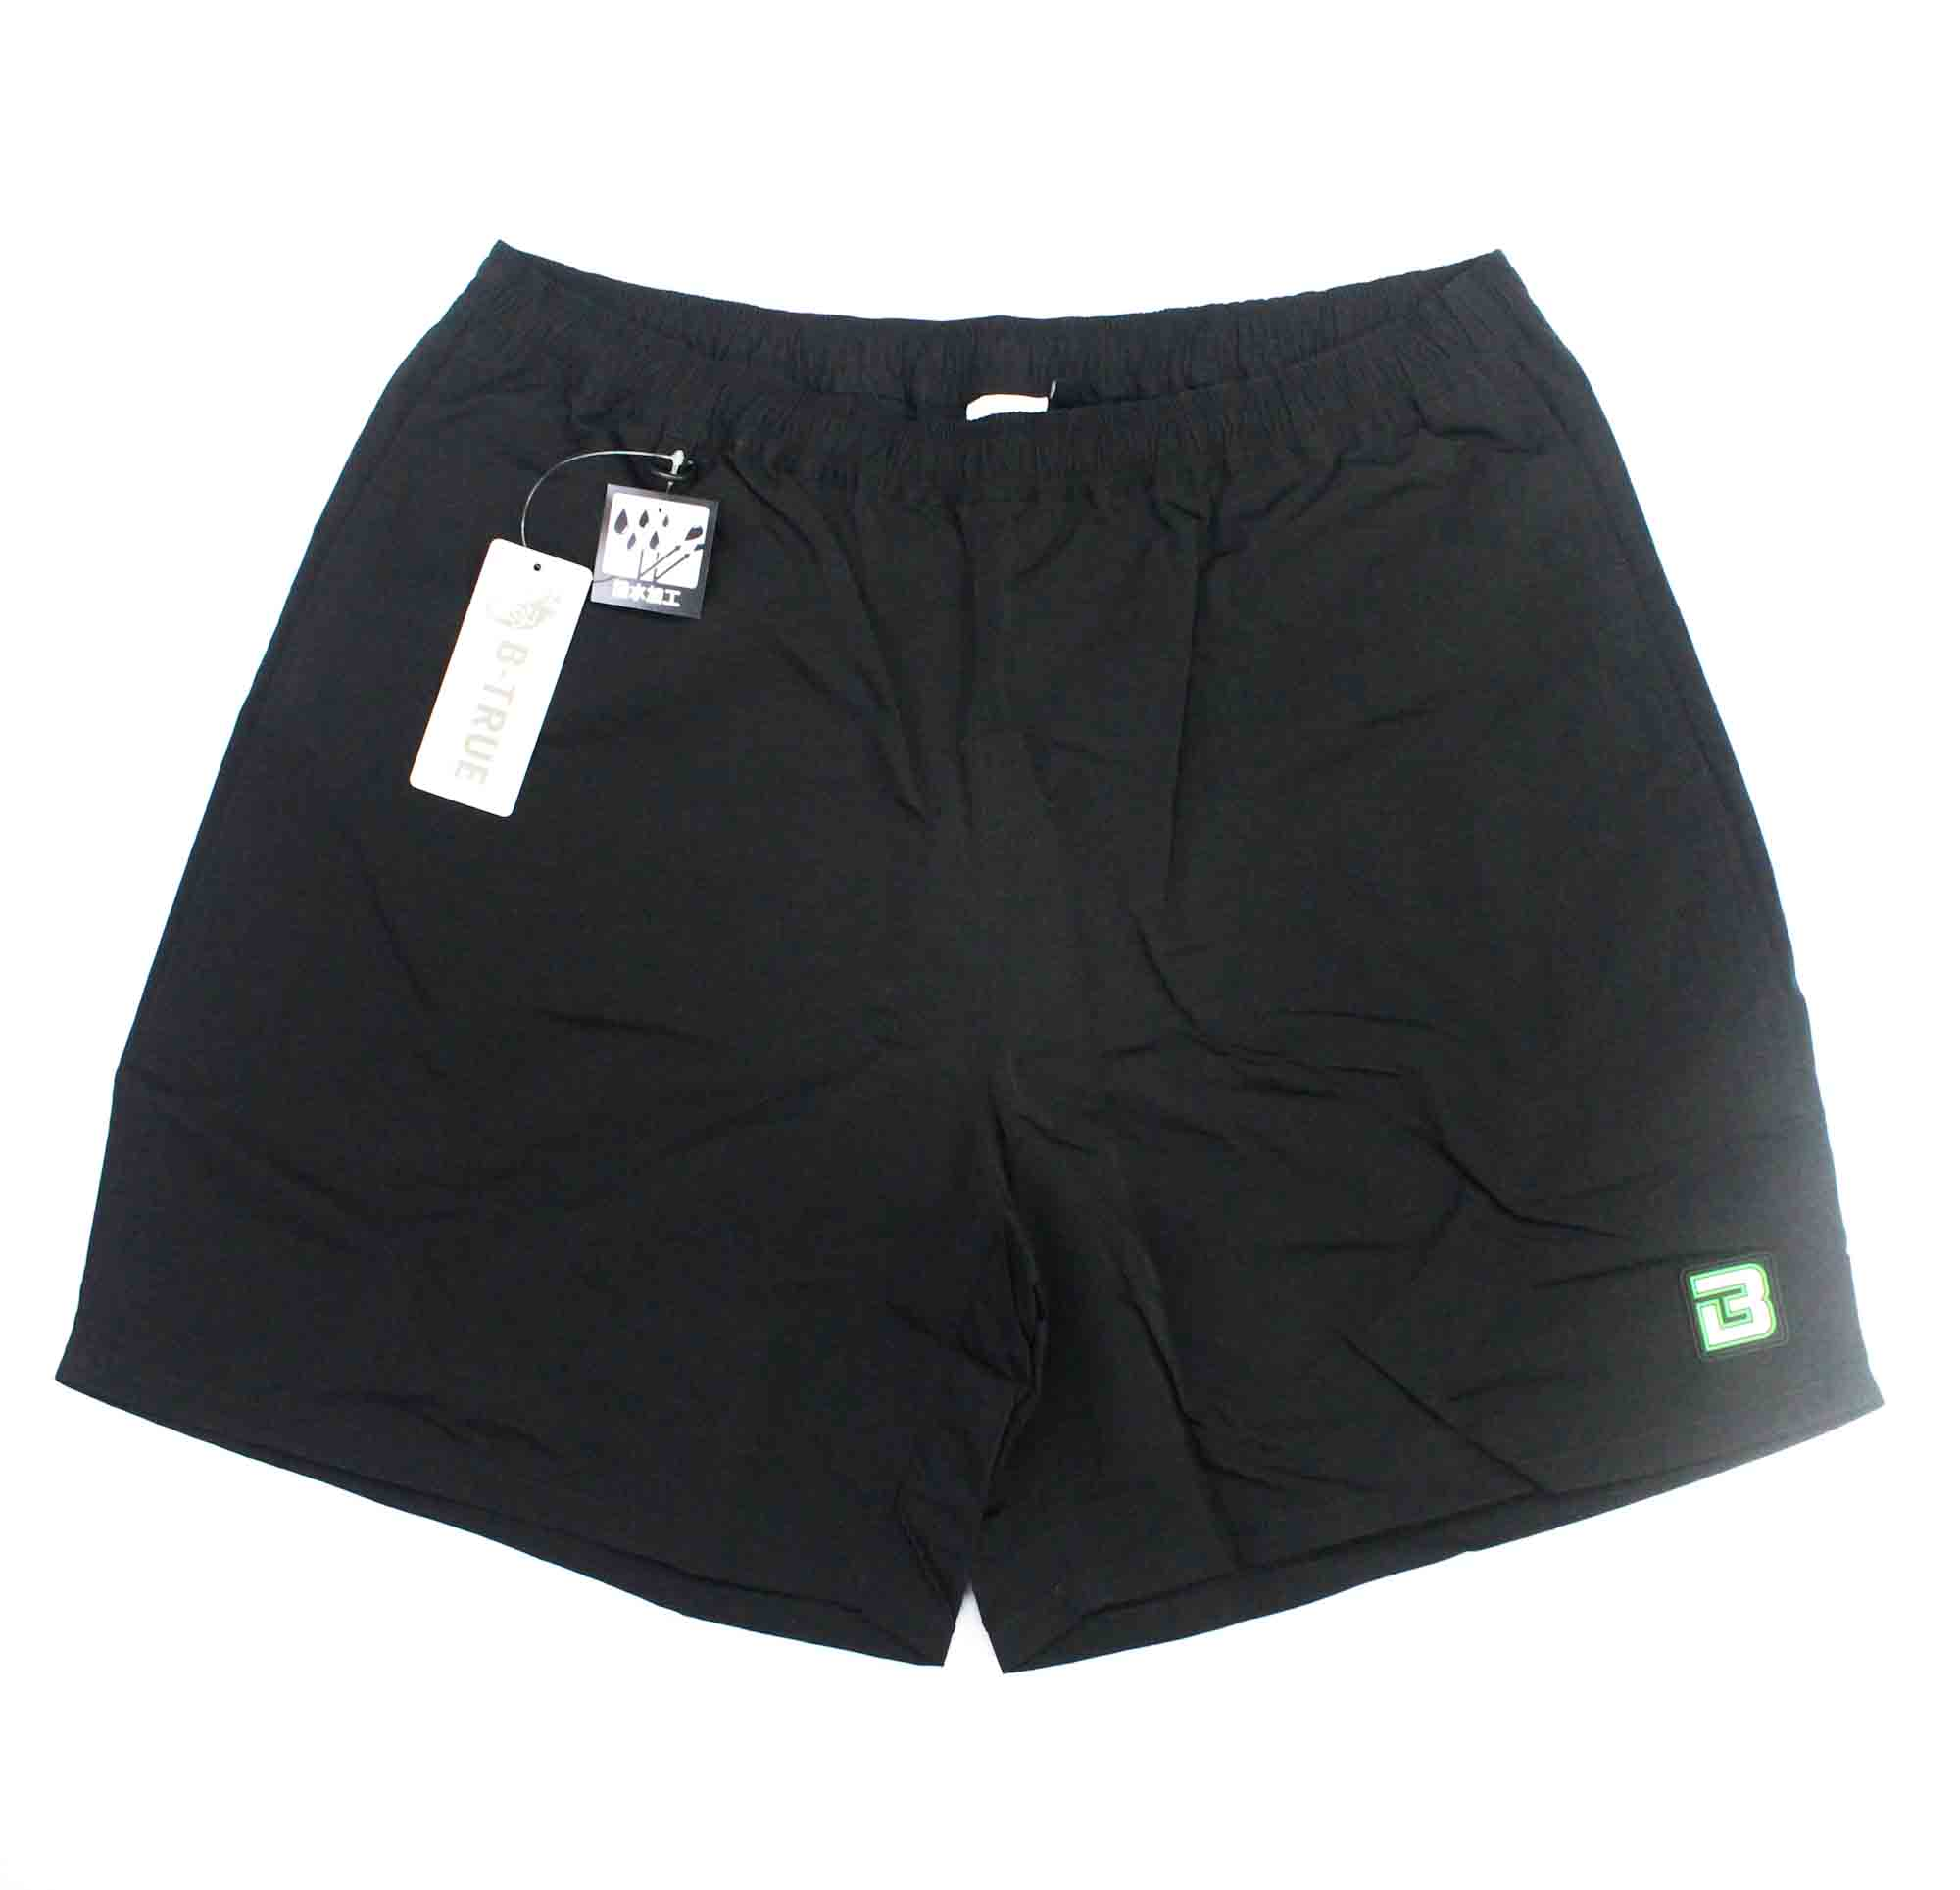 Evergreen Pants Shorts B True Size M Black (1324)